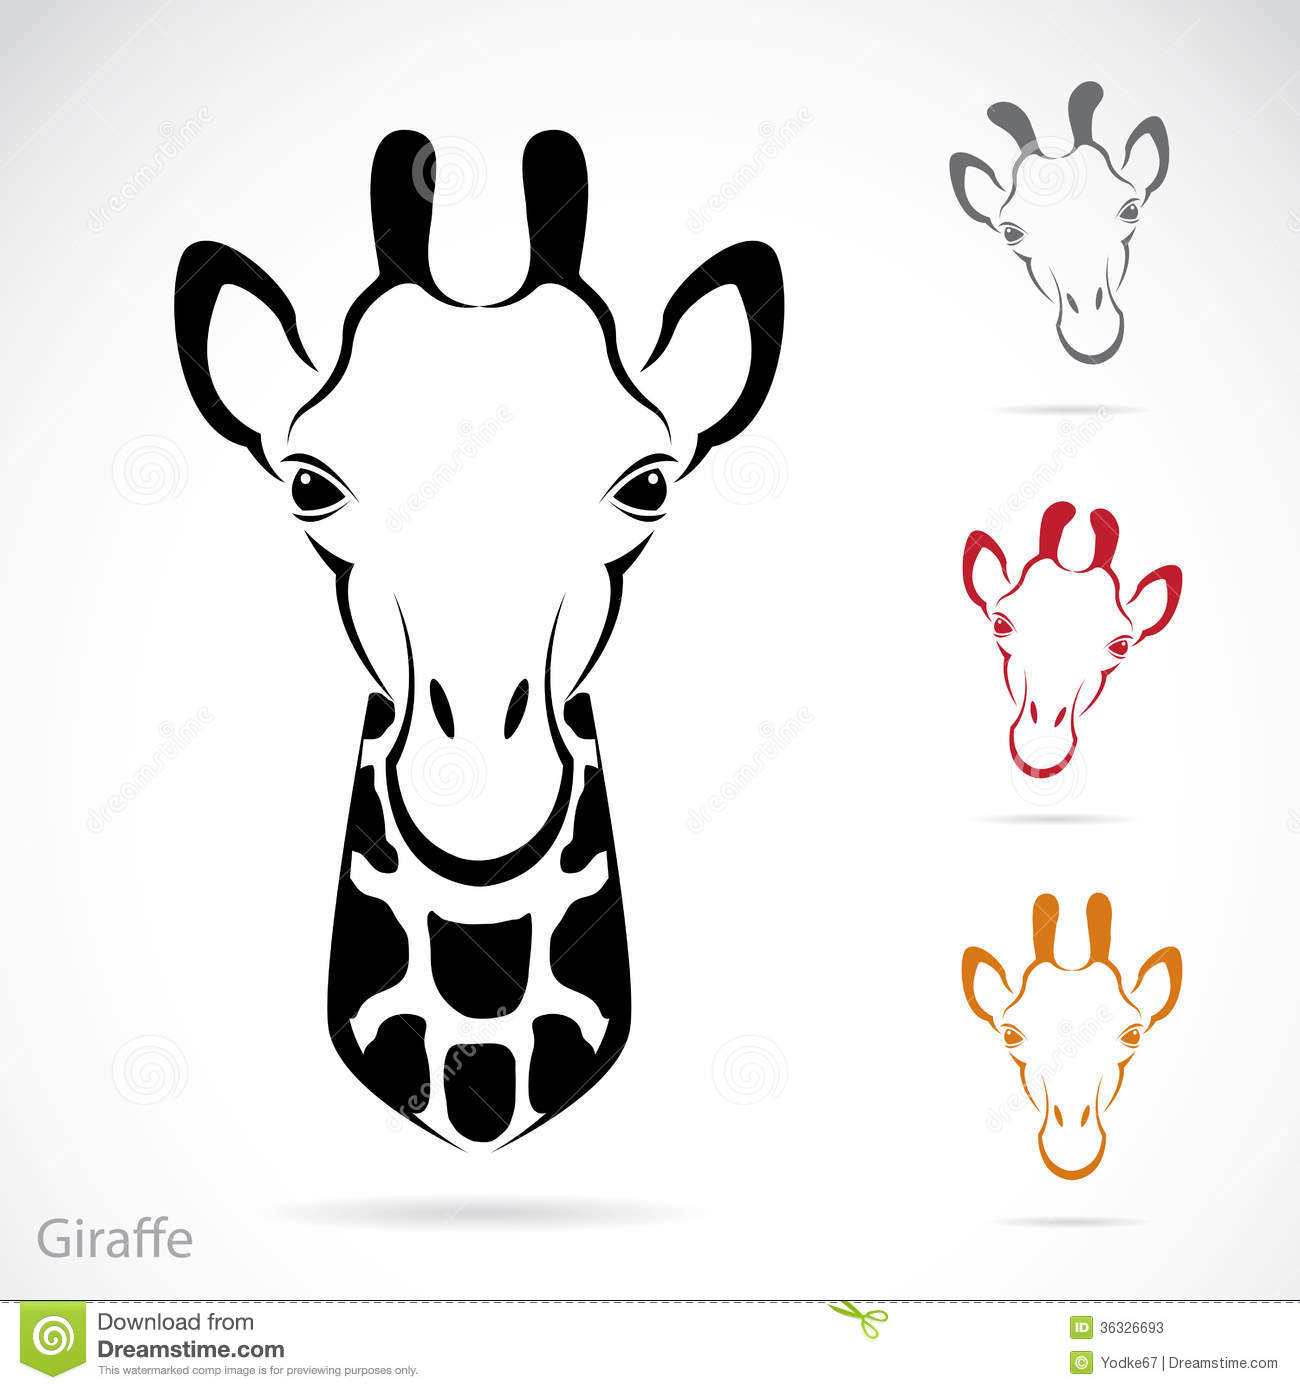 giraffe%20head%20clipart%20black%20and%20white